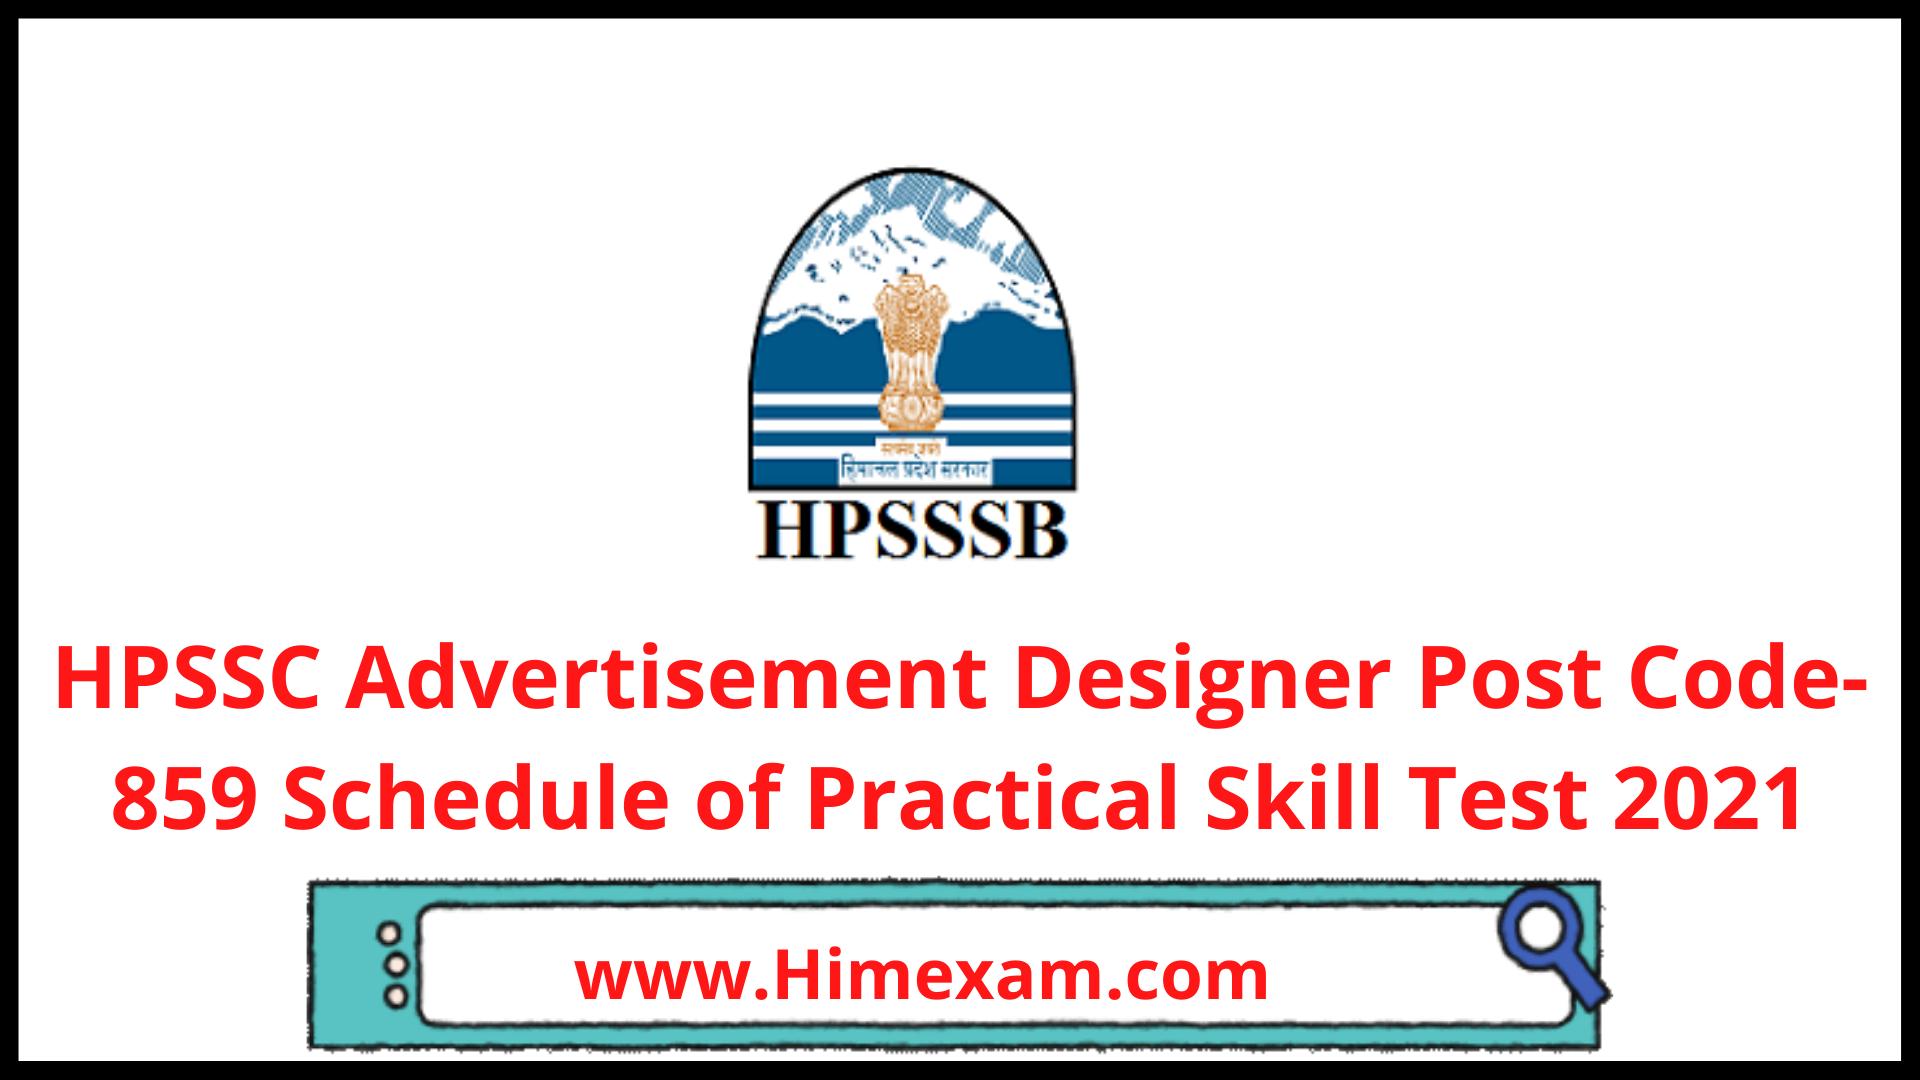 HPSSC Advertisement Designer Post Code-859 Schedule of Practical Skill Test 2021